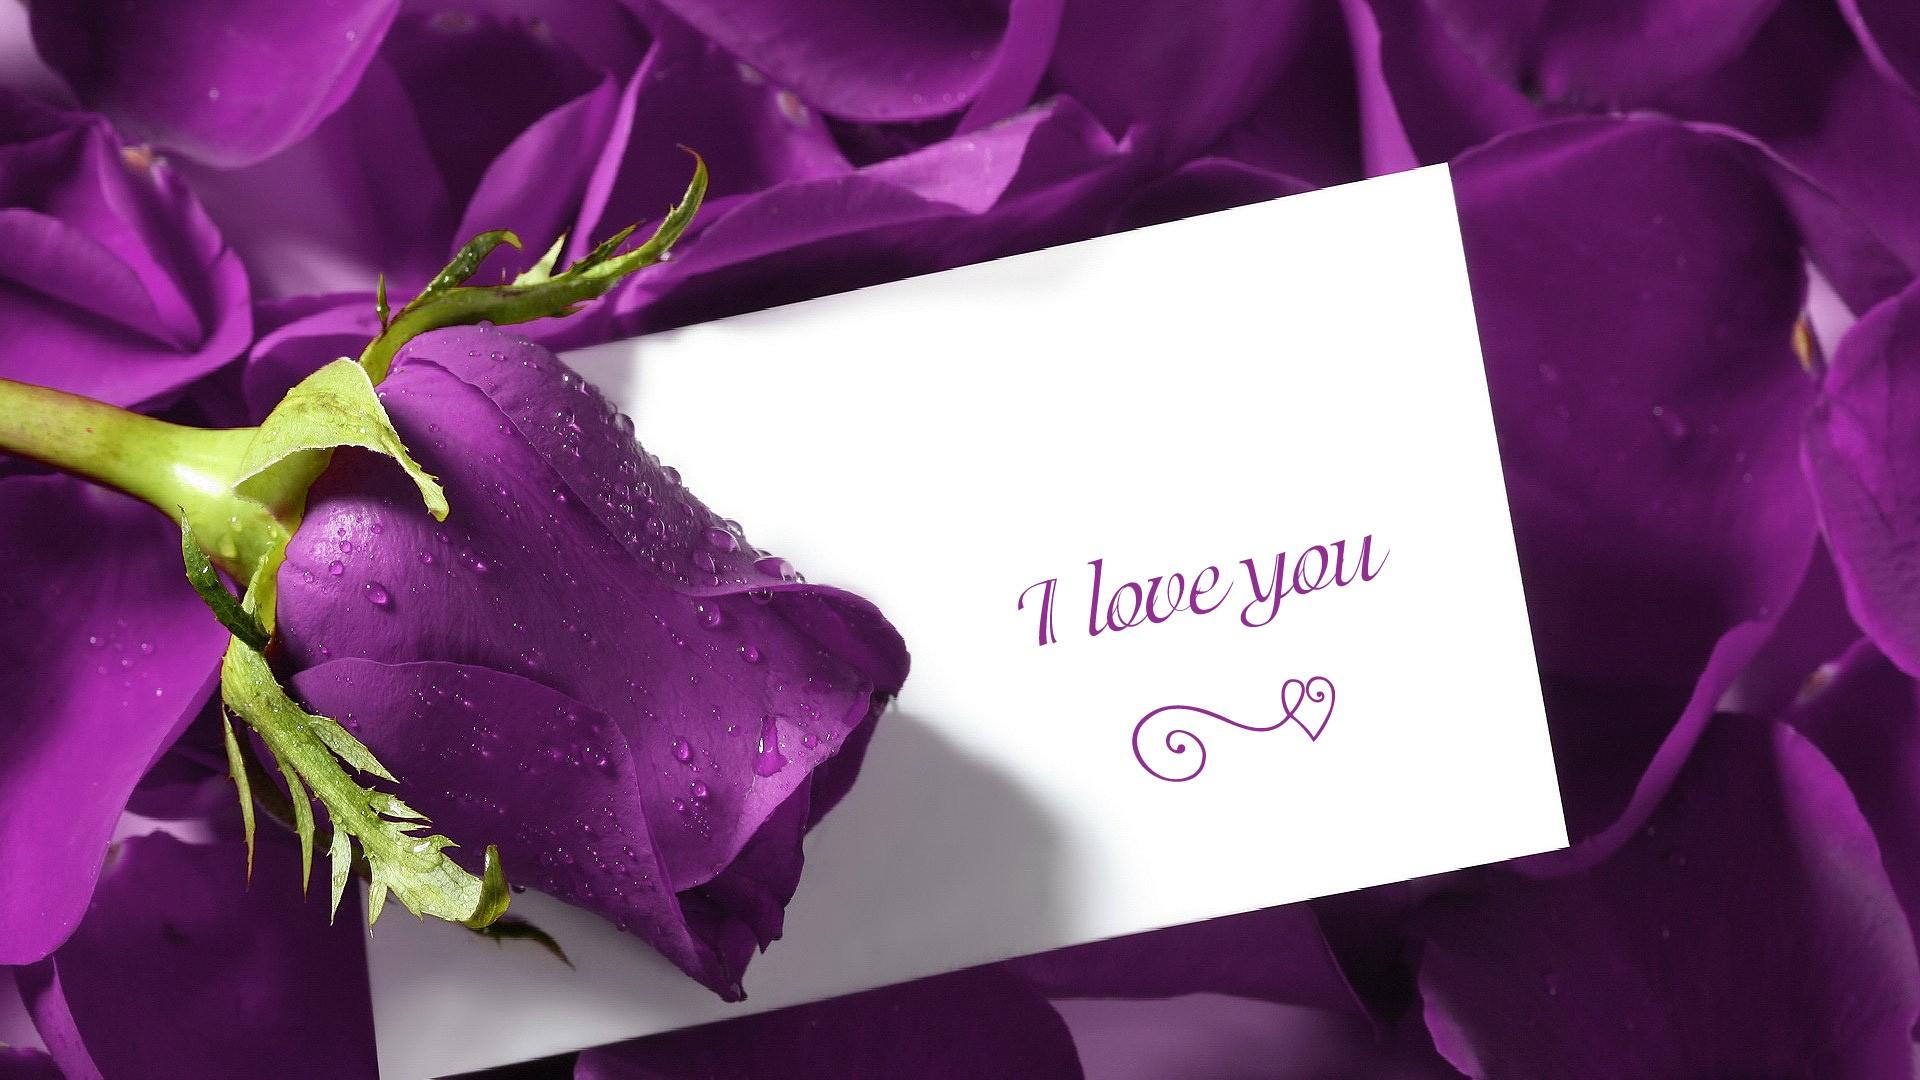 Hd wallpaper i love you - Love You Valentine Cards Hd Wallpaper Of Love Hdwallpaper2013 Com